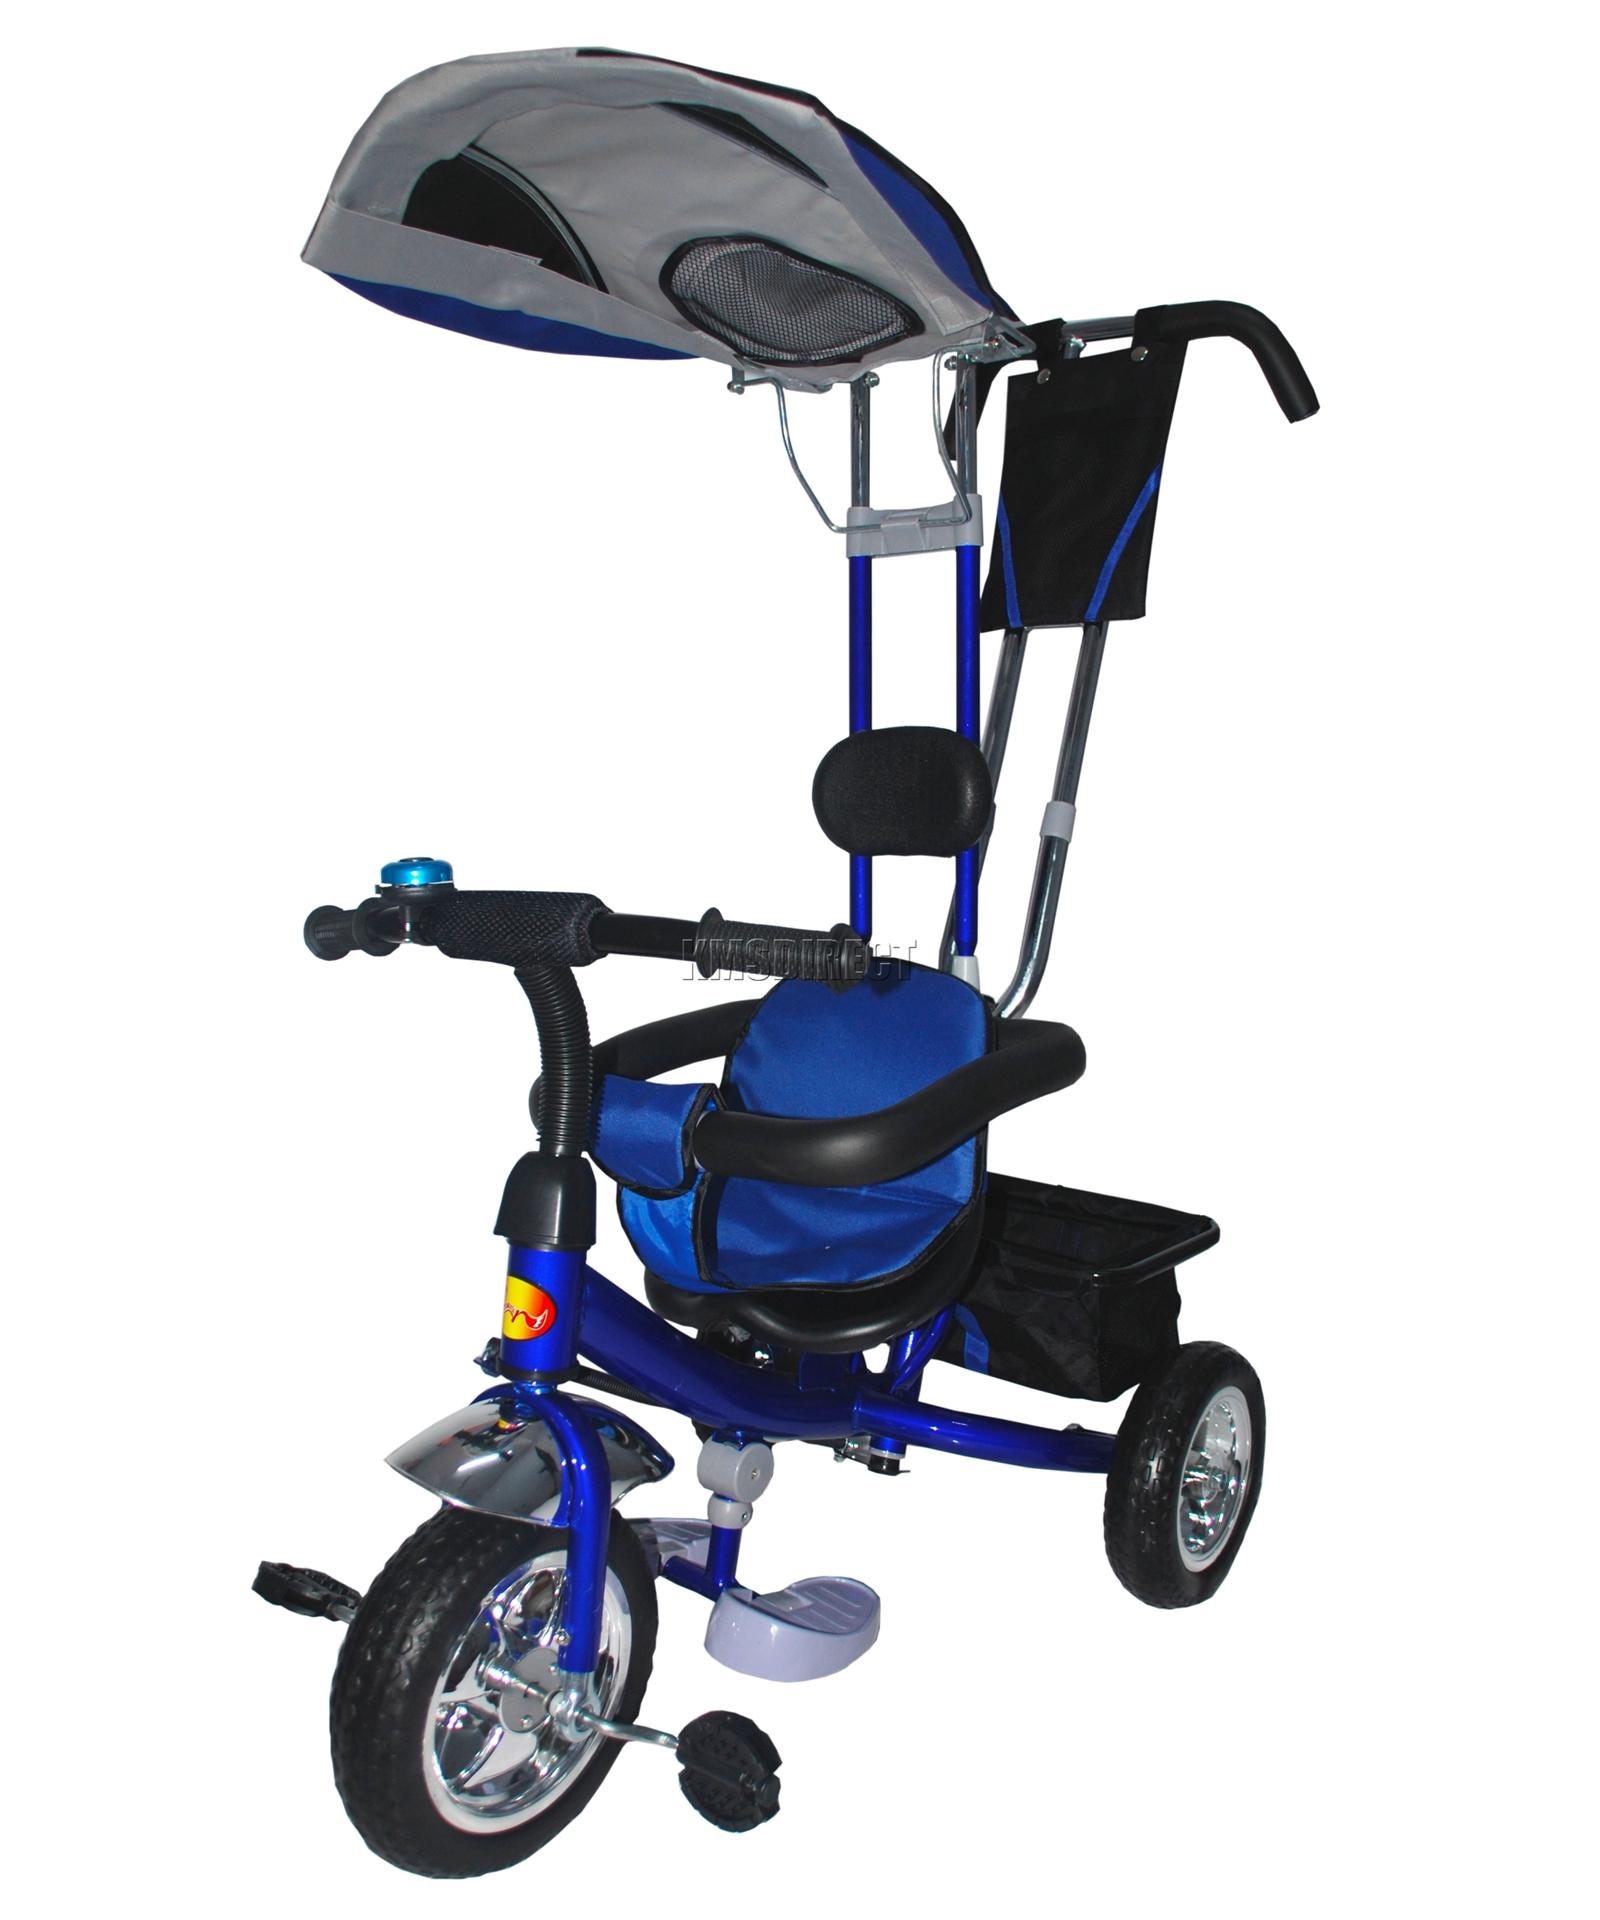 FoxHunter 4In1 Children Kids Trike Tricycle 3 Wheel Ride Bike ...